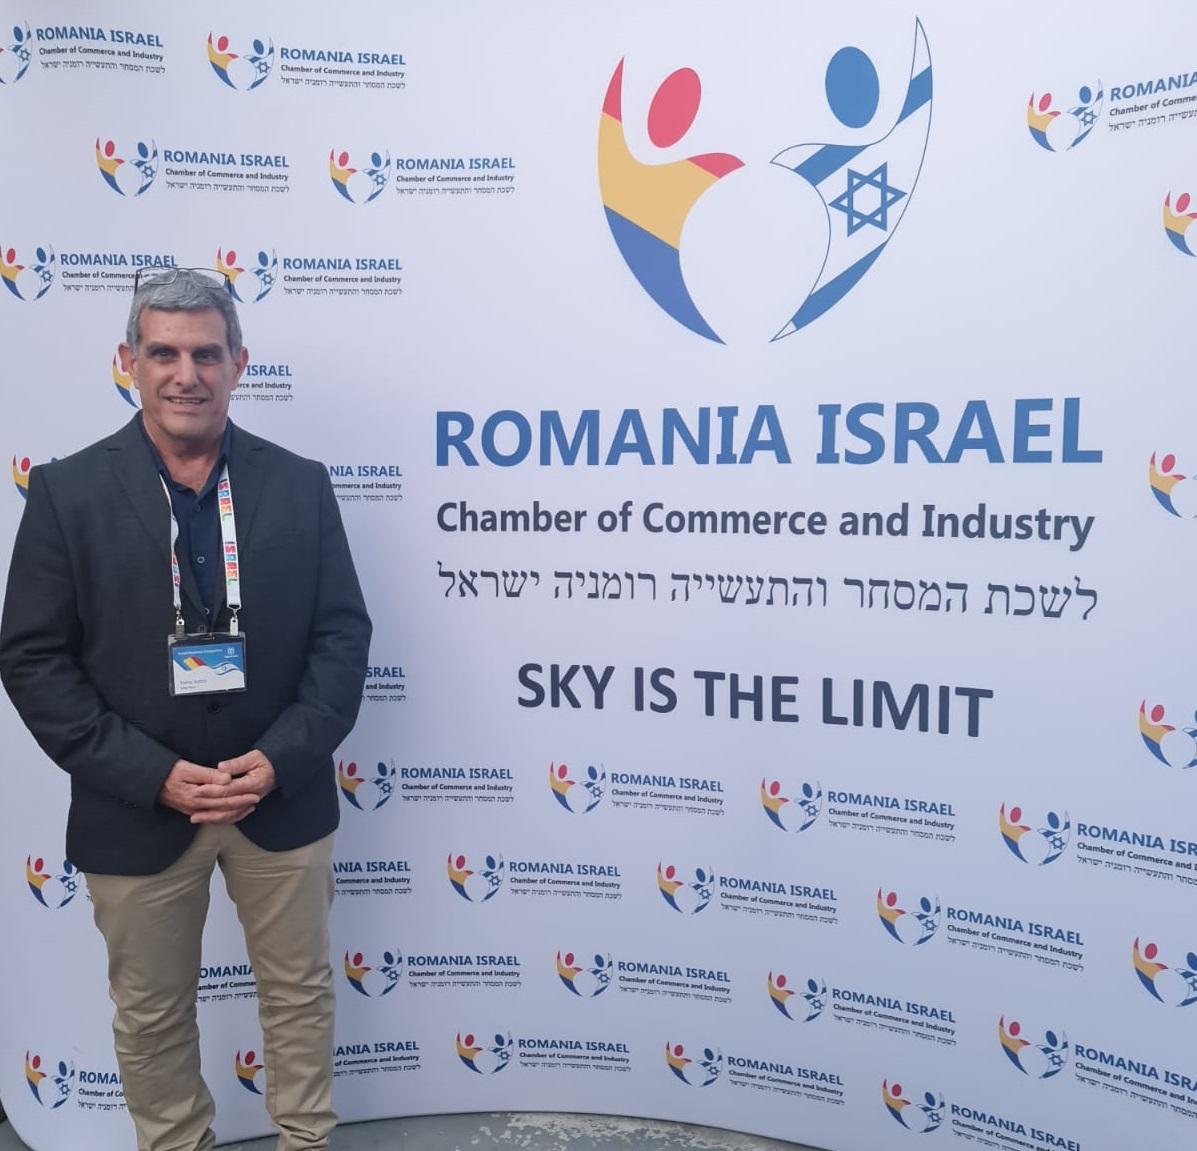 Romania Israel Chamber of Commerce